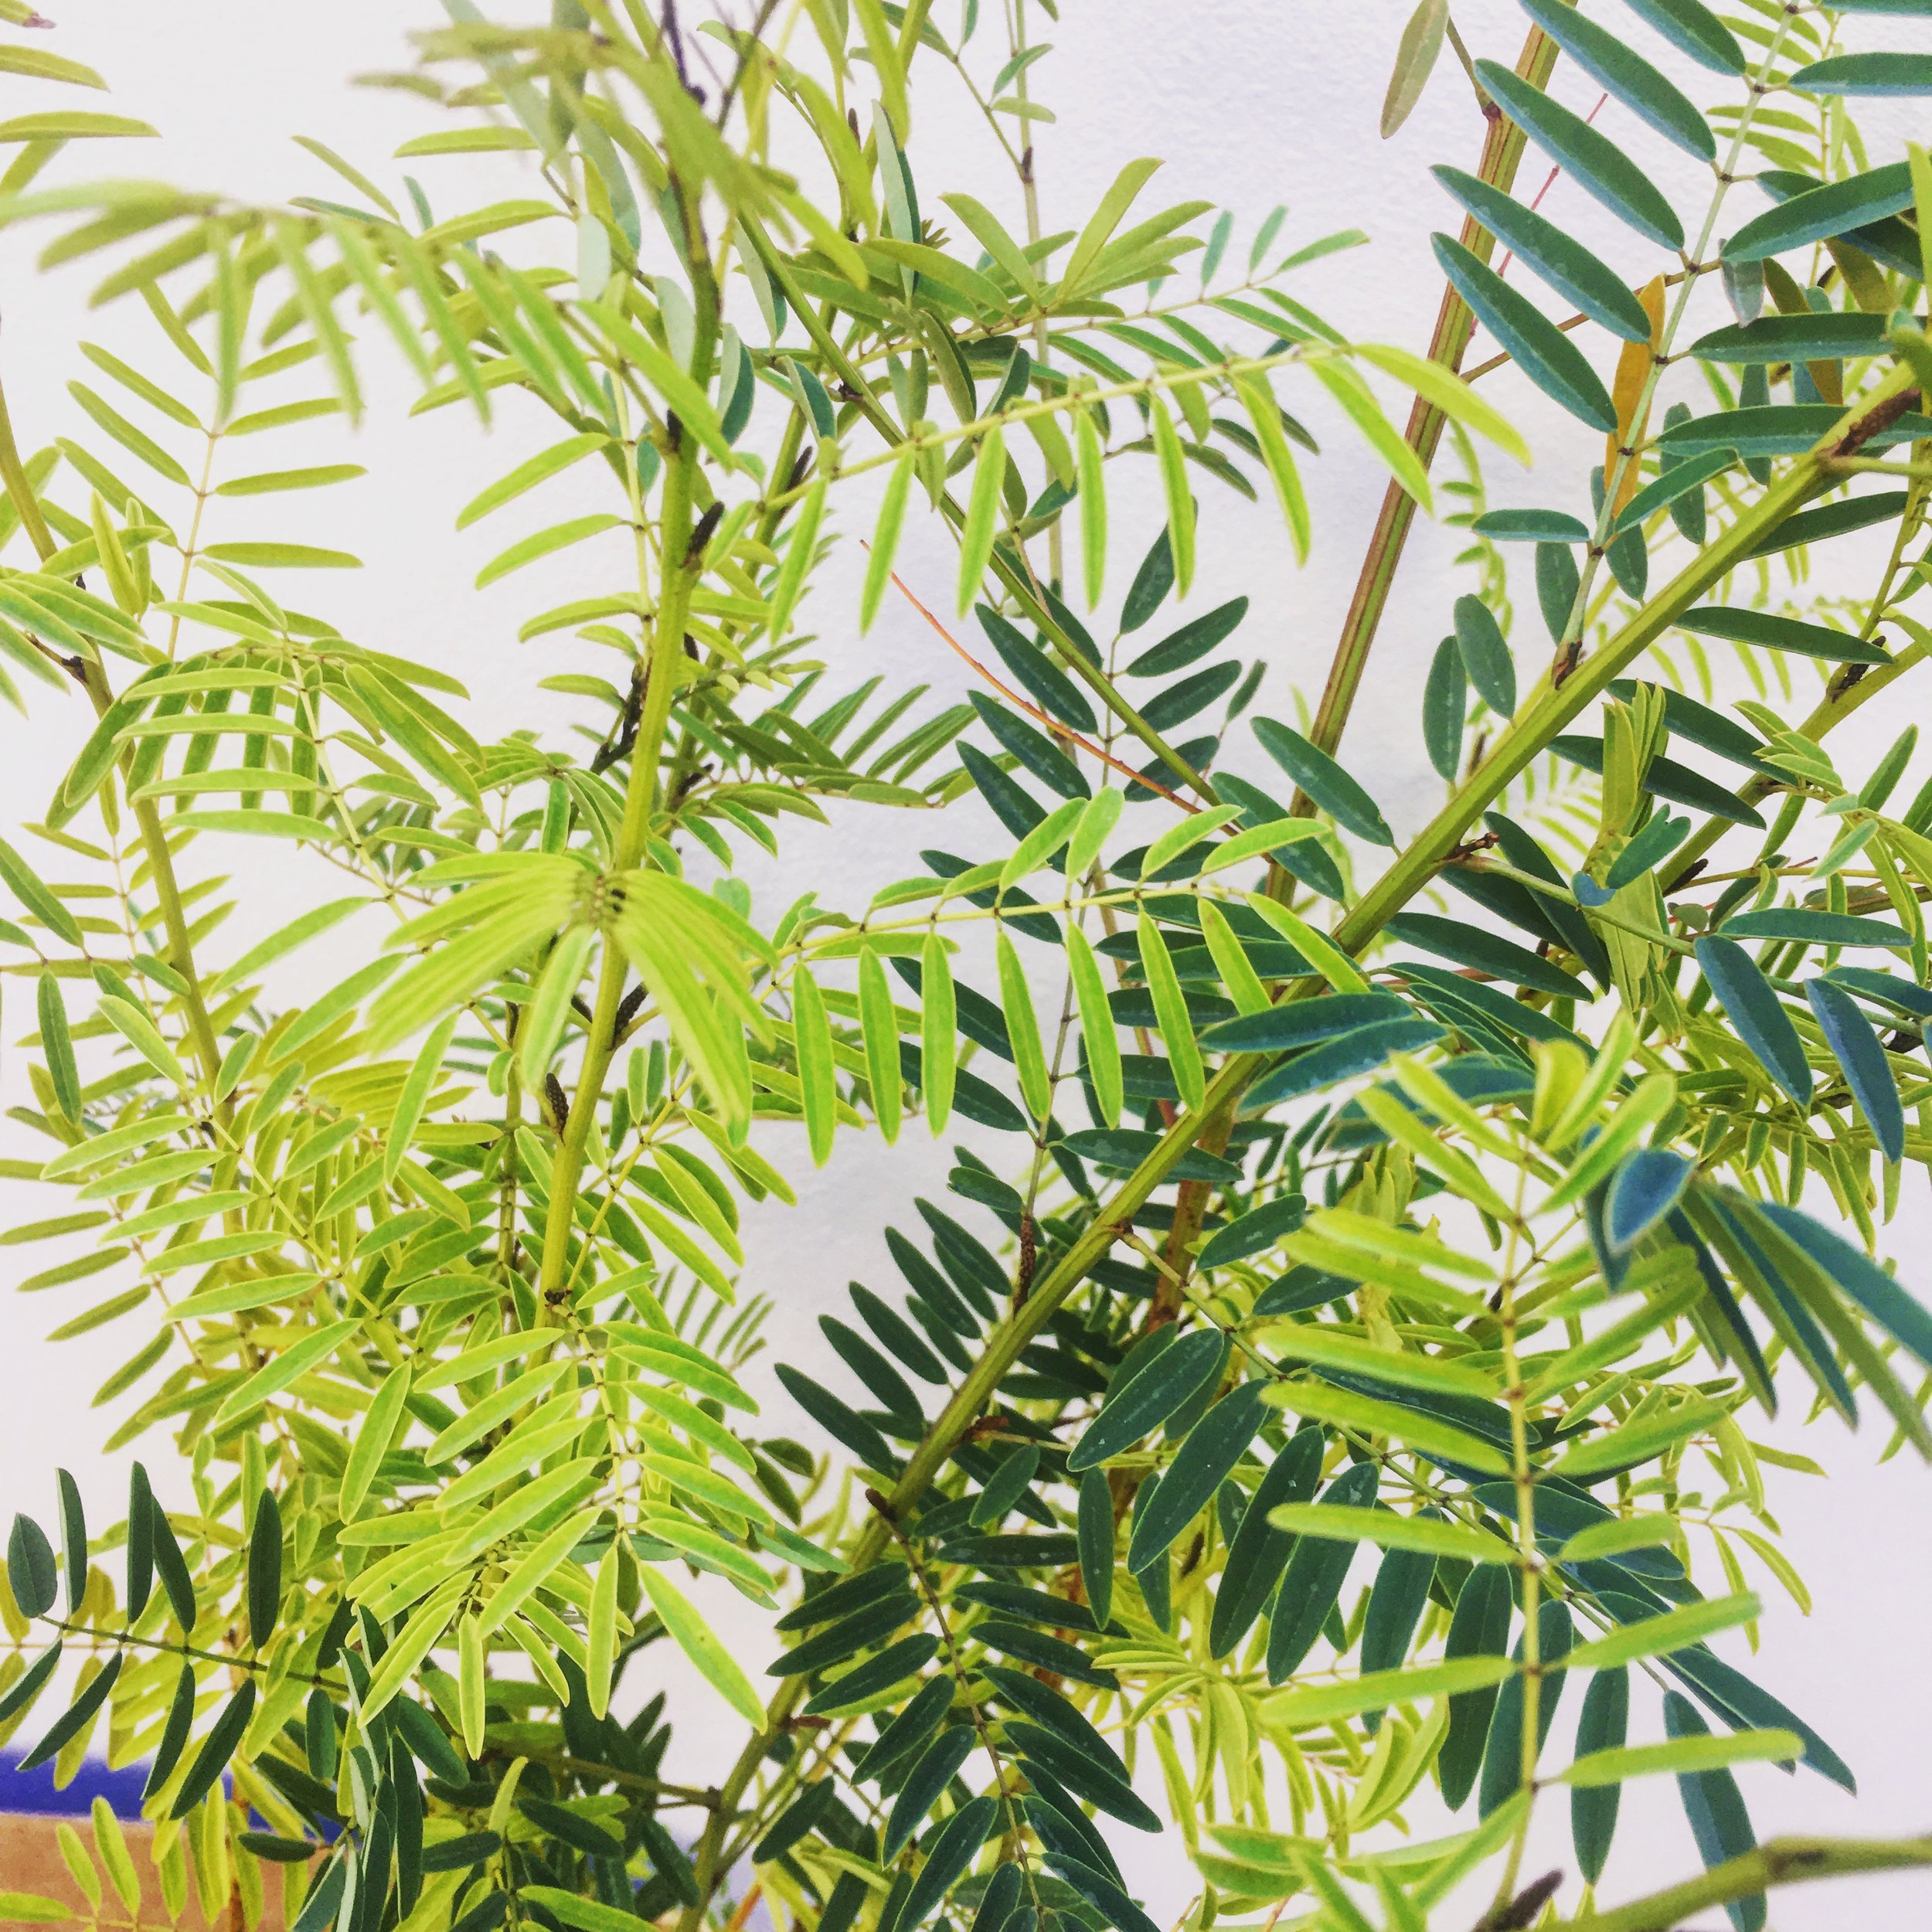 My native Australian indigo plants,  Indigofera australis.